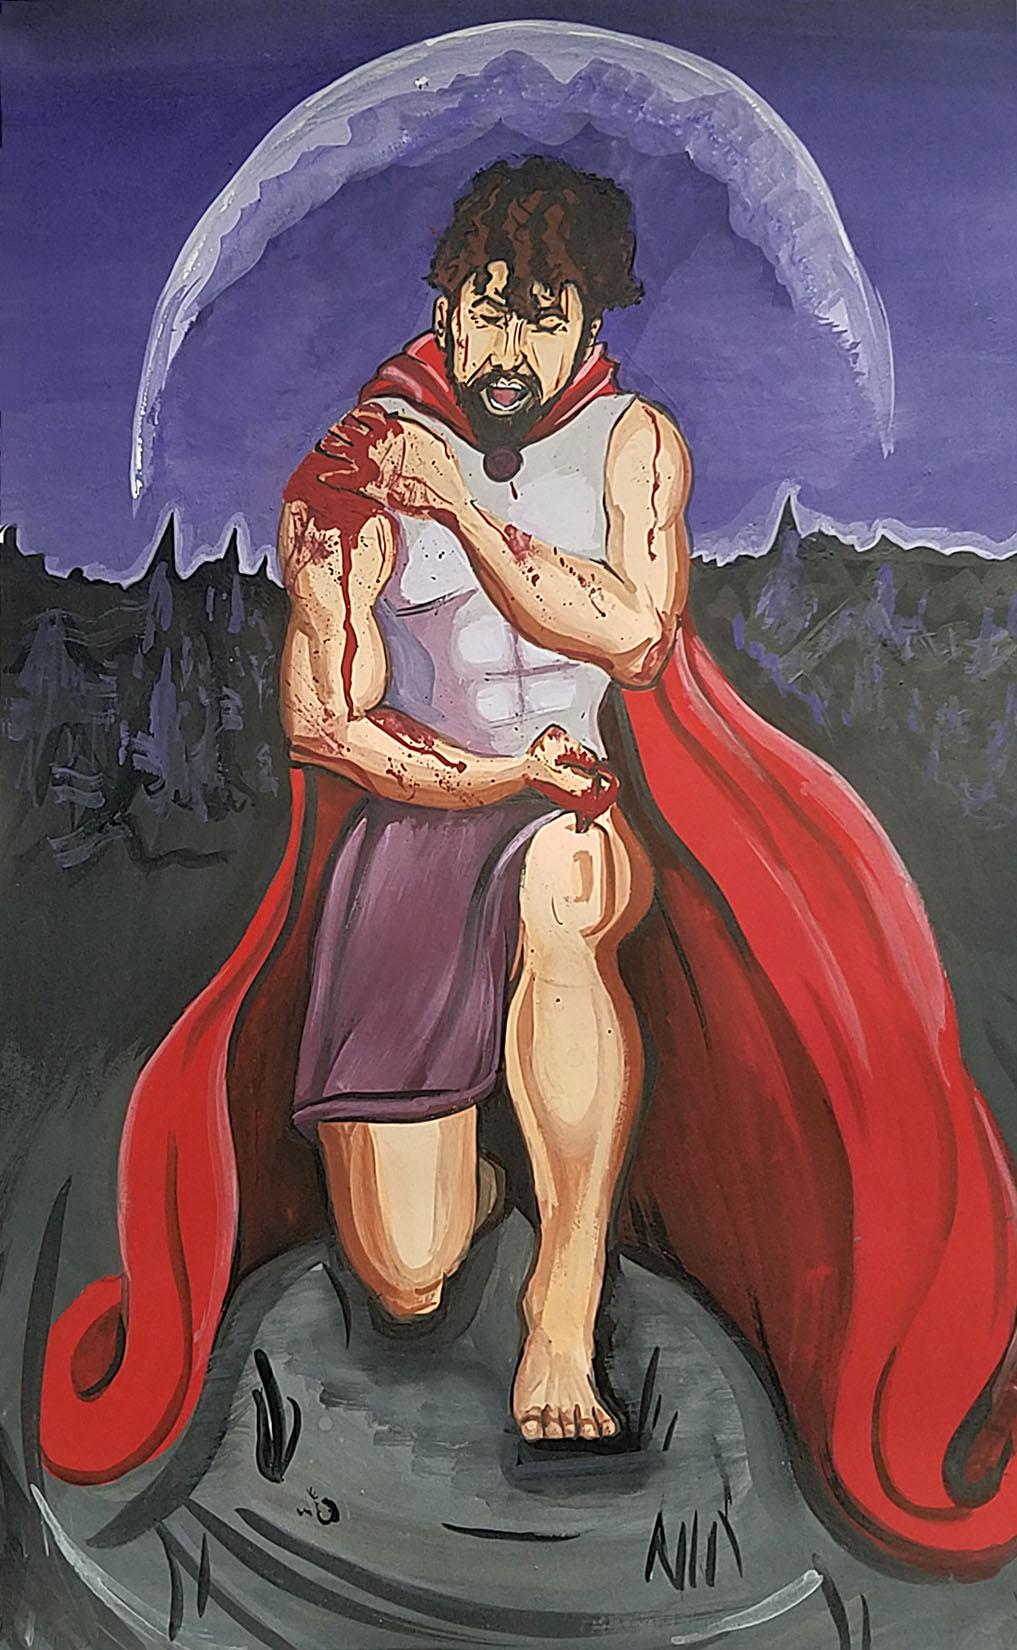 Hercules student artwork from MassArt, Fournier